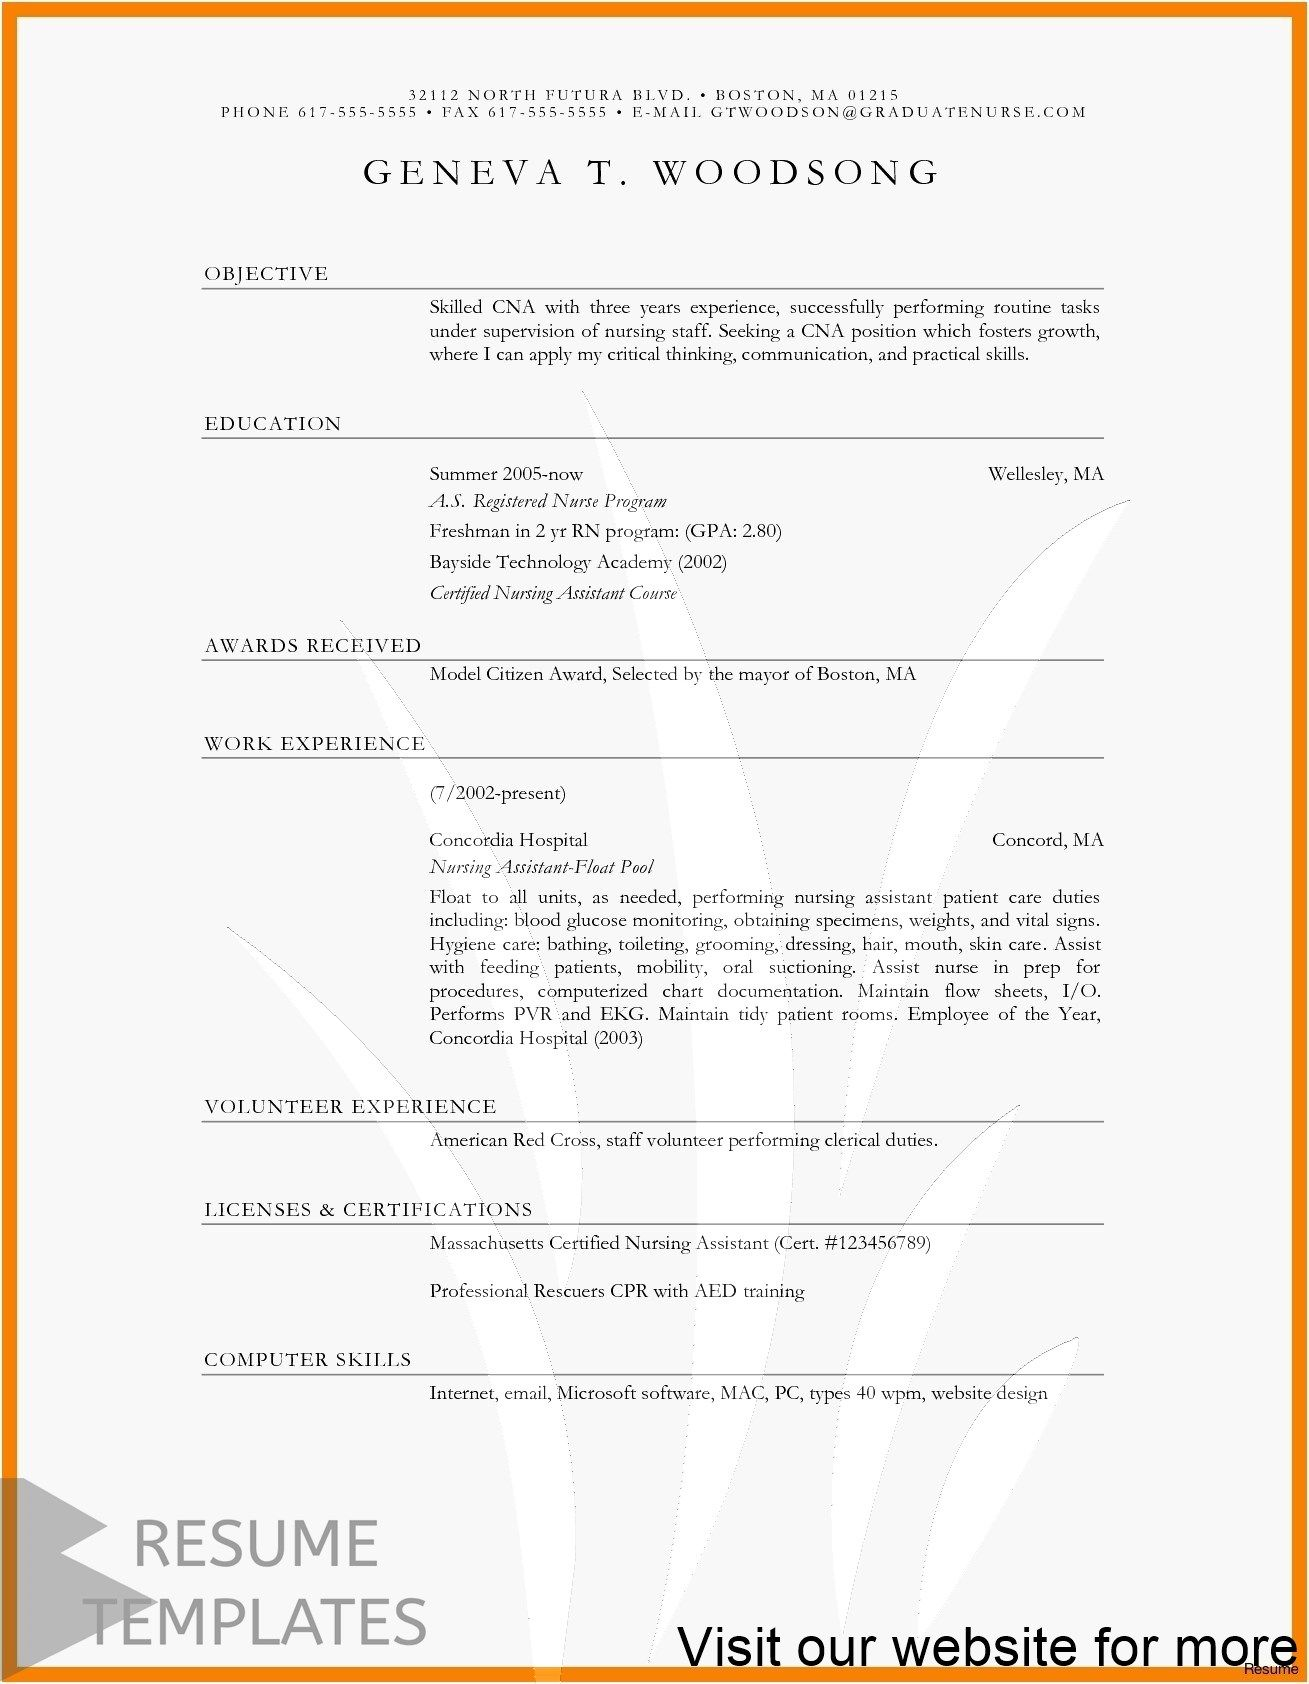 college student resume builder 2020 in 2020 Resume